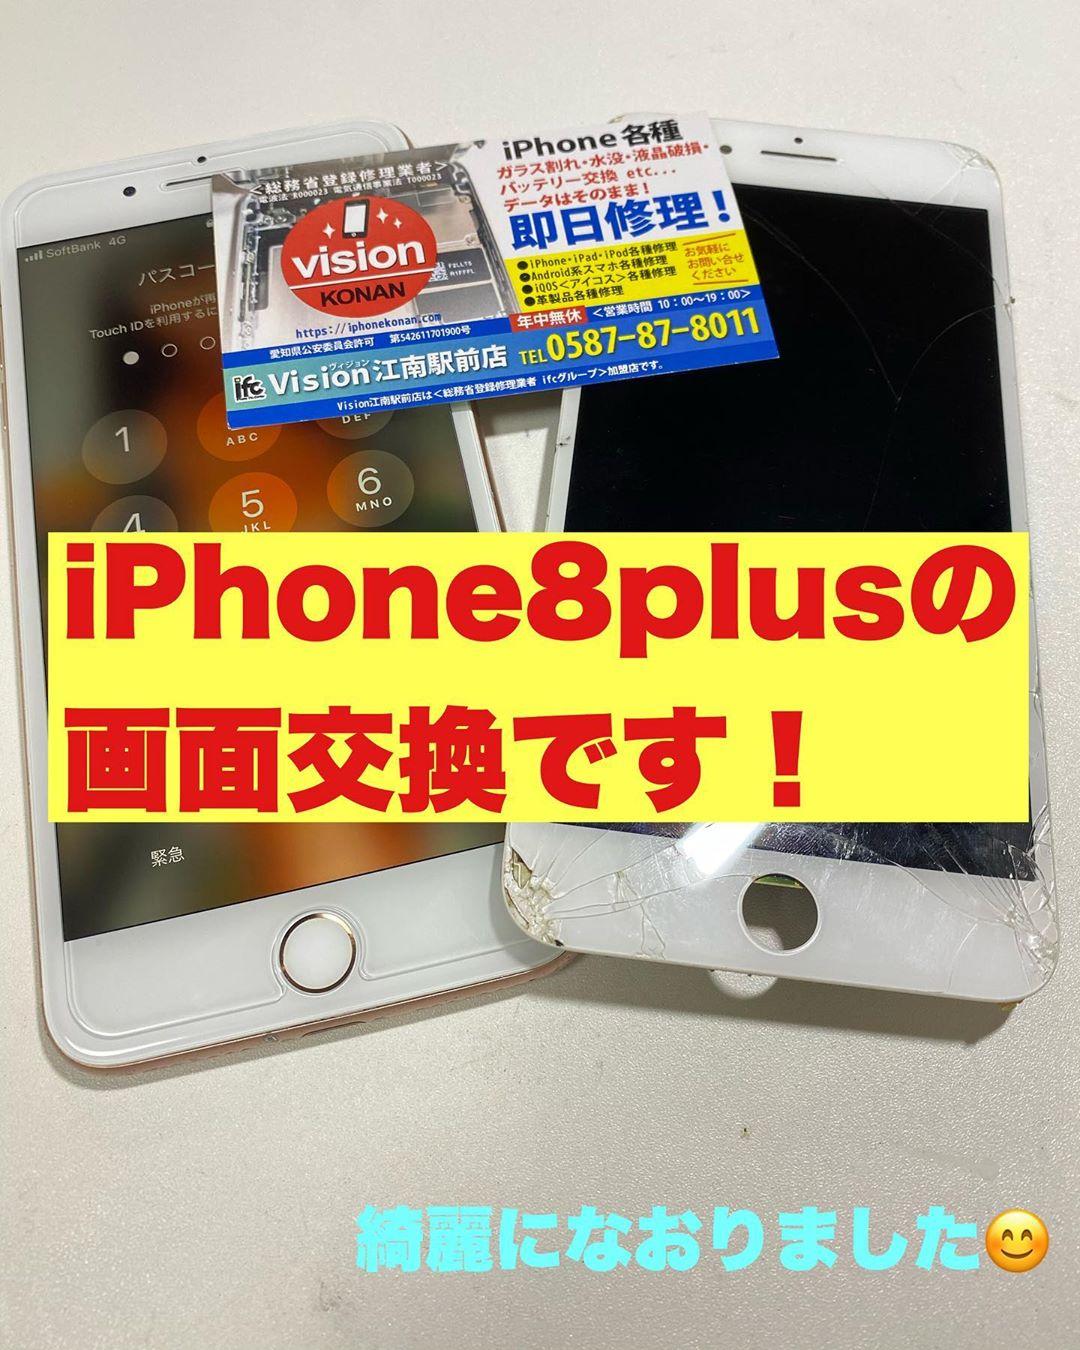 iPhone8Plus 画面交換 江南 江南市 ヴィジョン江南駅前店